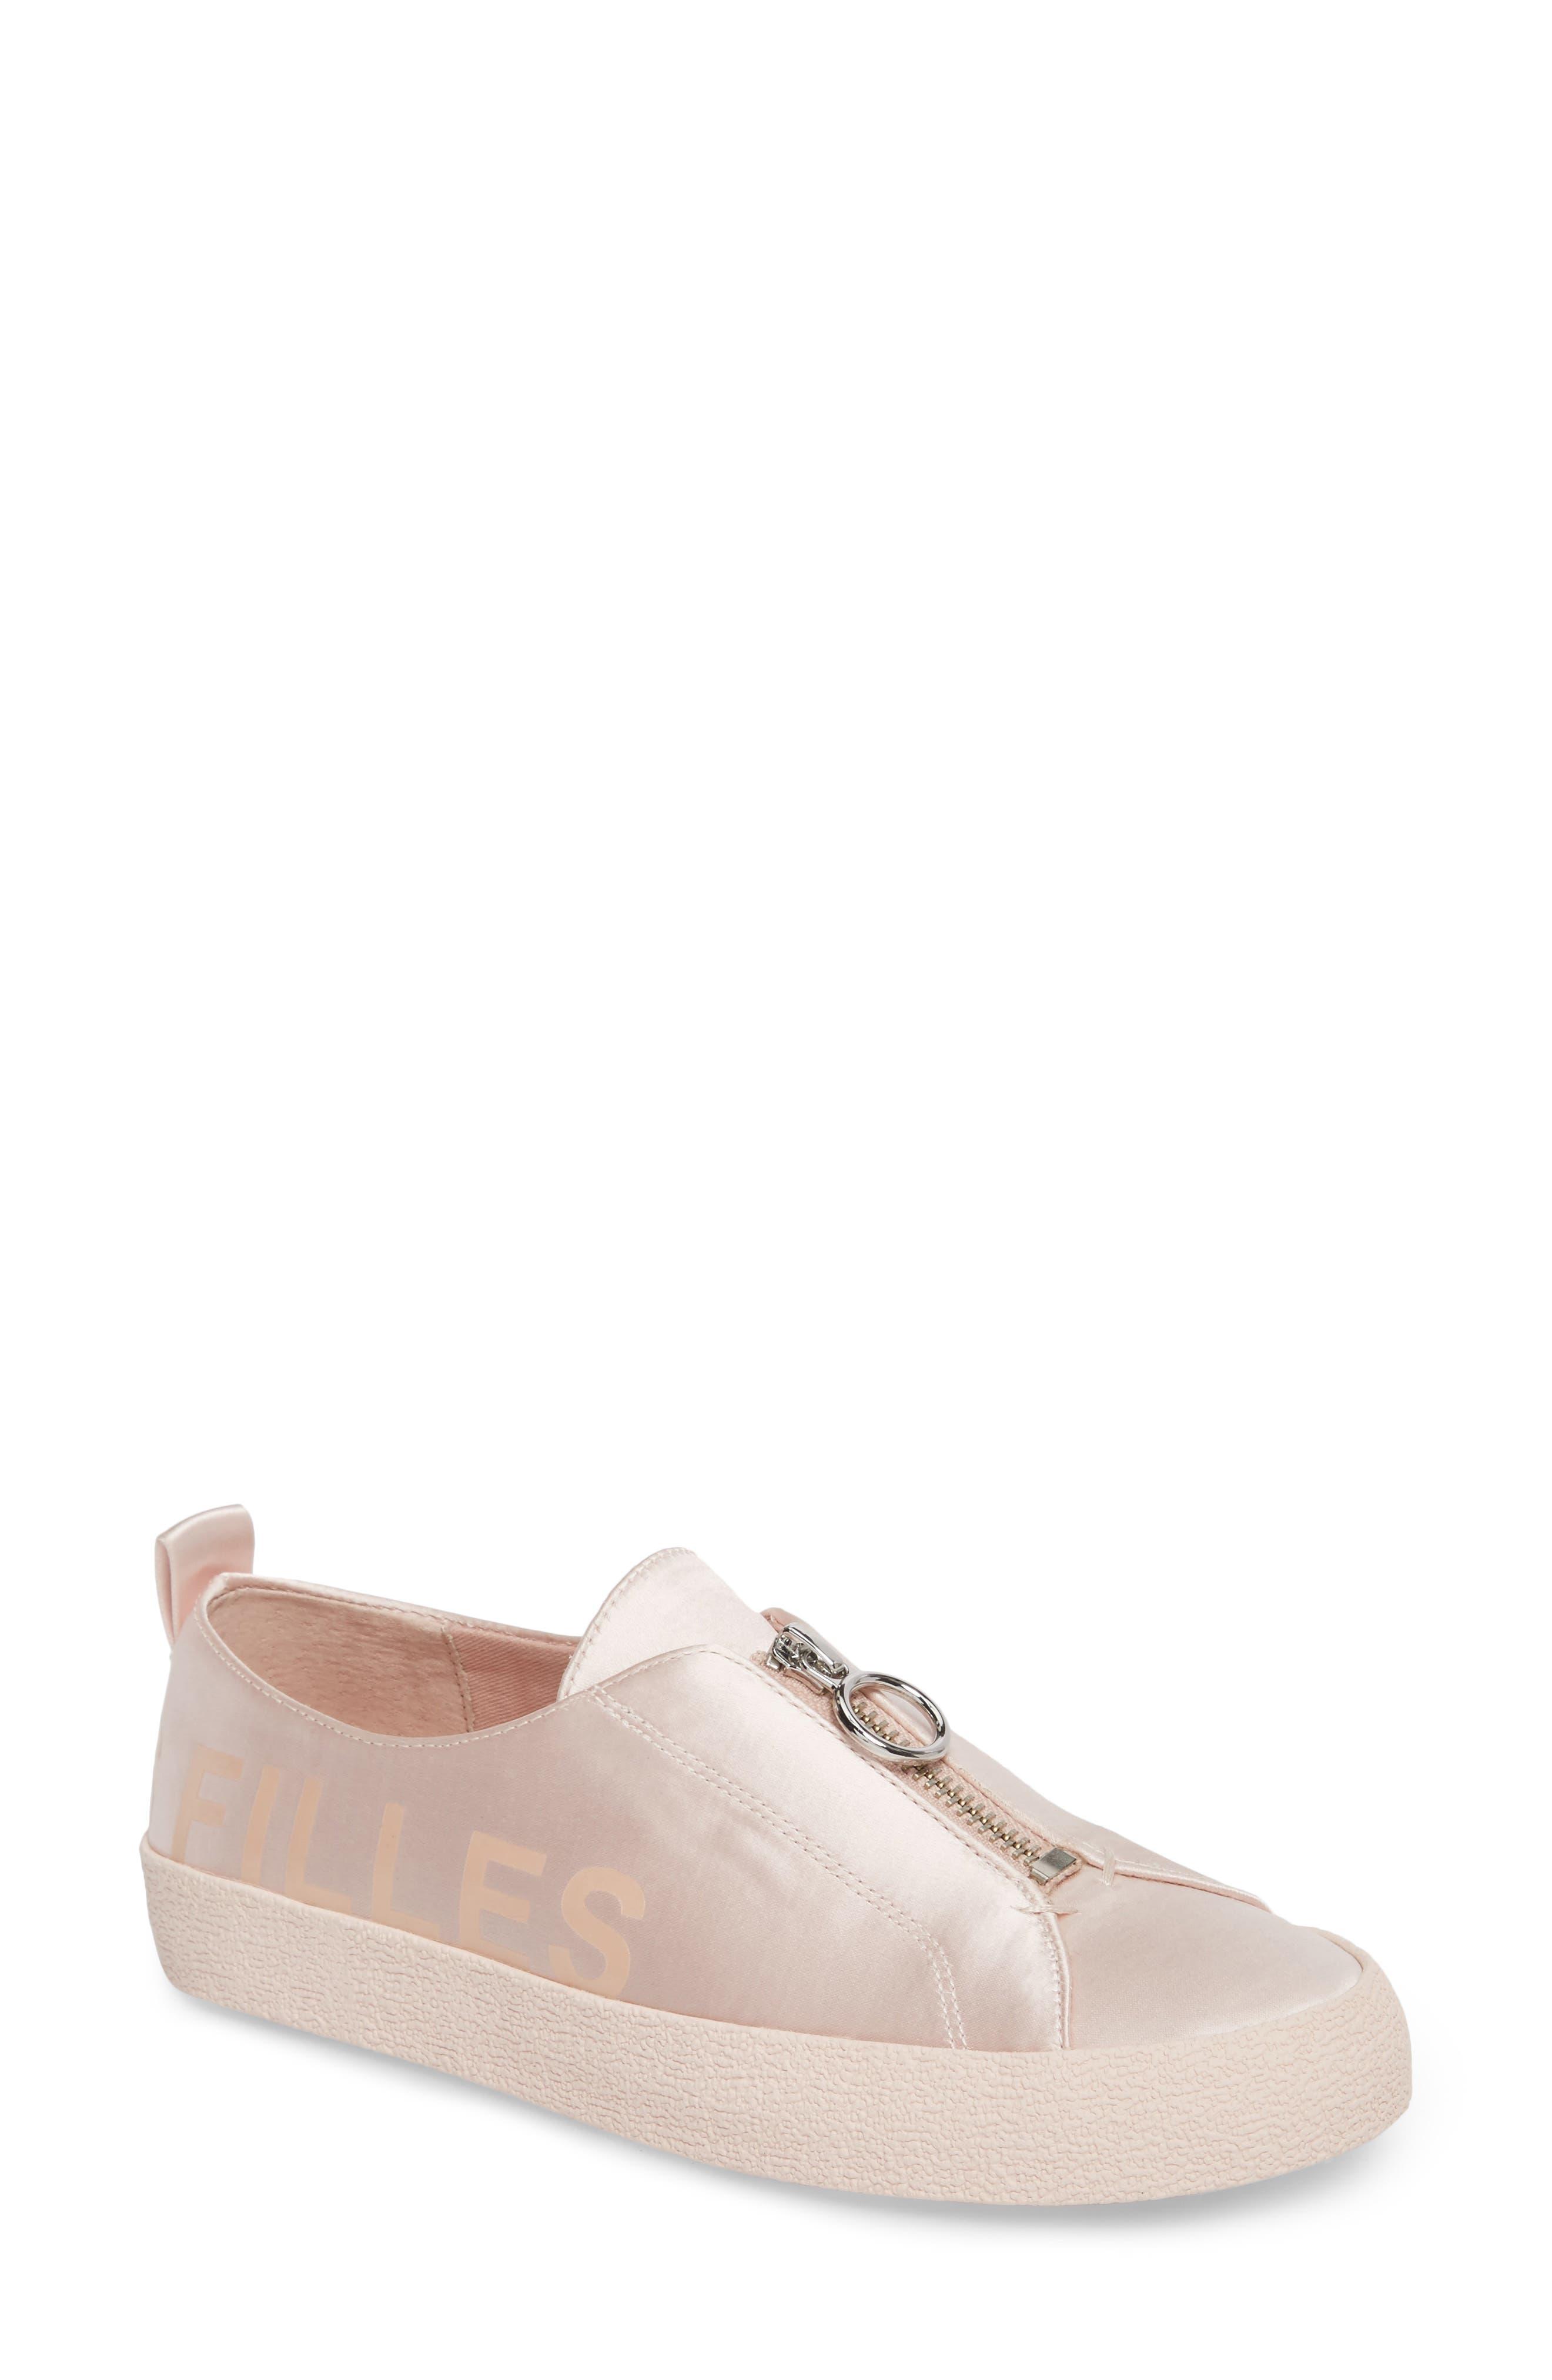 Sasha Zip Sneaker,                             Main thumbnail 1, color,                             Avec Pink Fabric